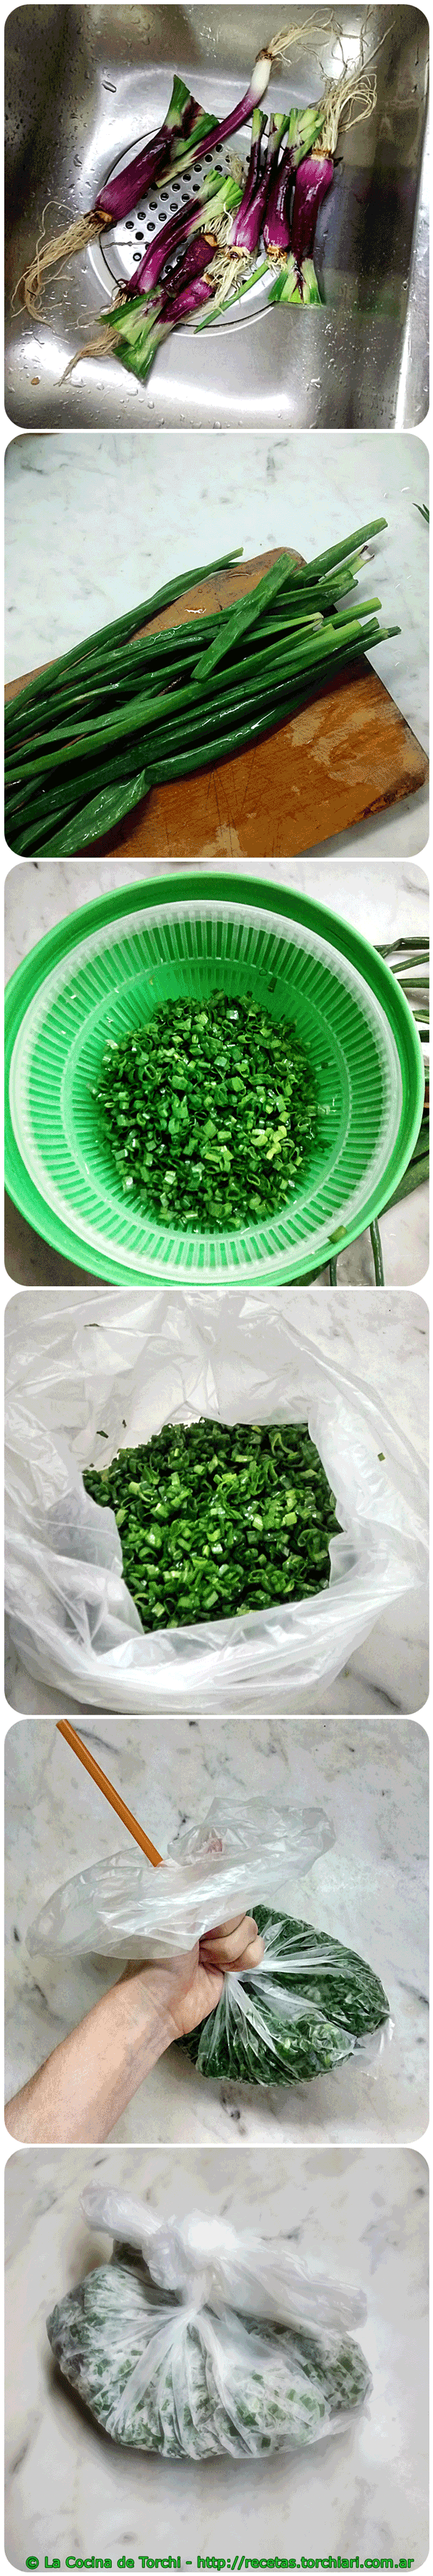 Cebolla de verdeo freezer